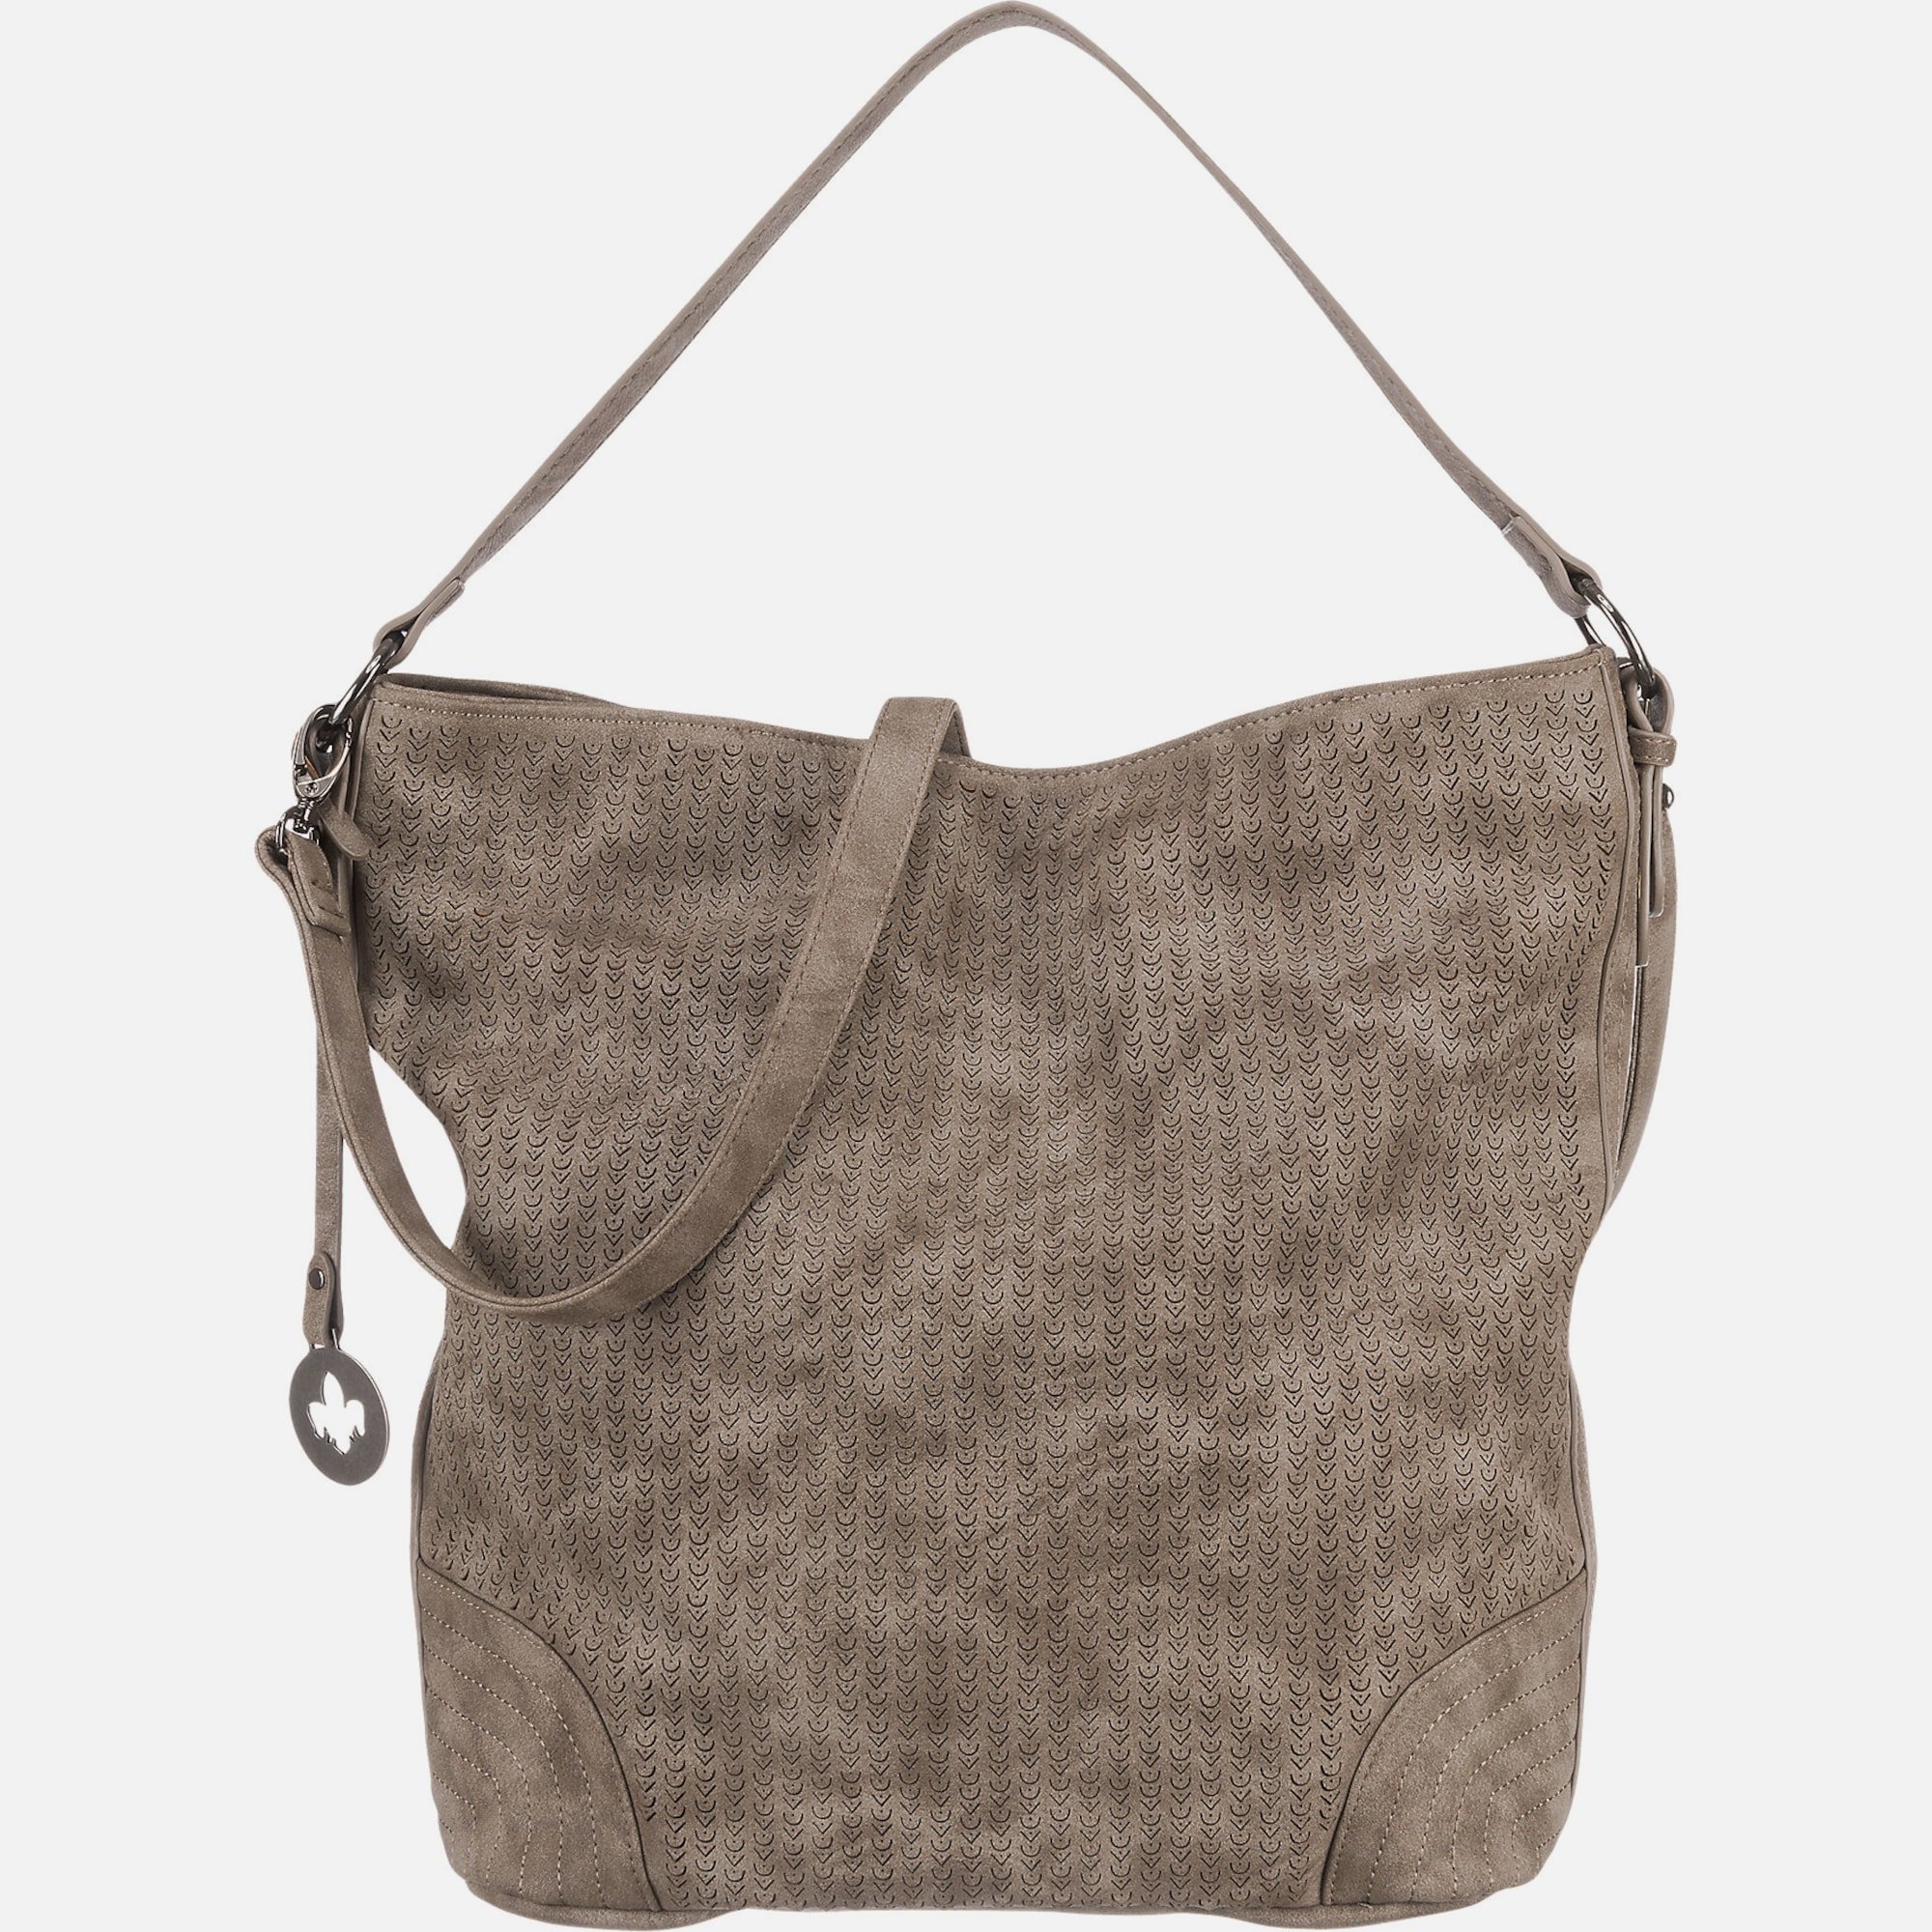 rieker handtasche in braun about you. Black Bedroom Furniture Sets. Home Design Ideas